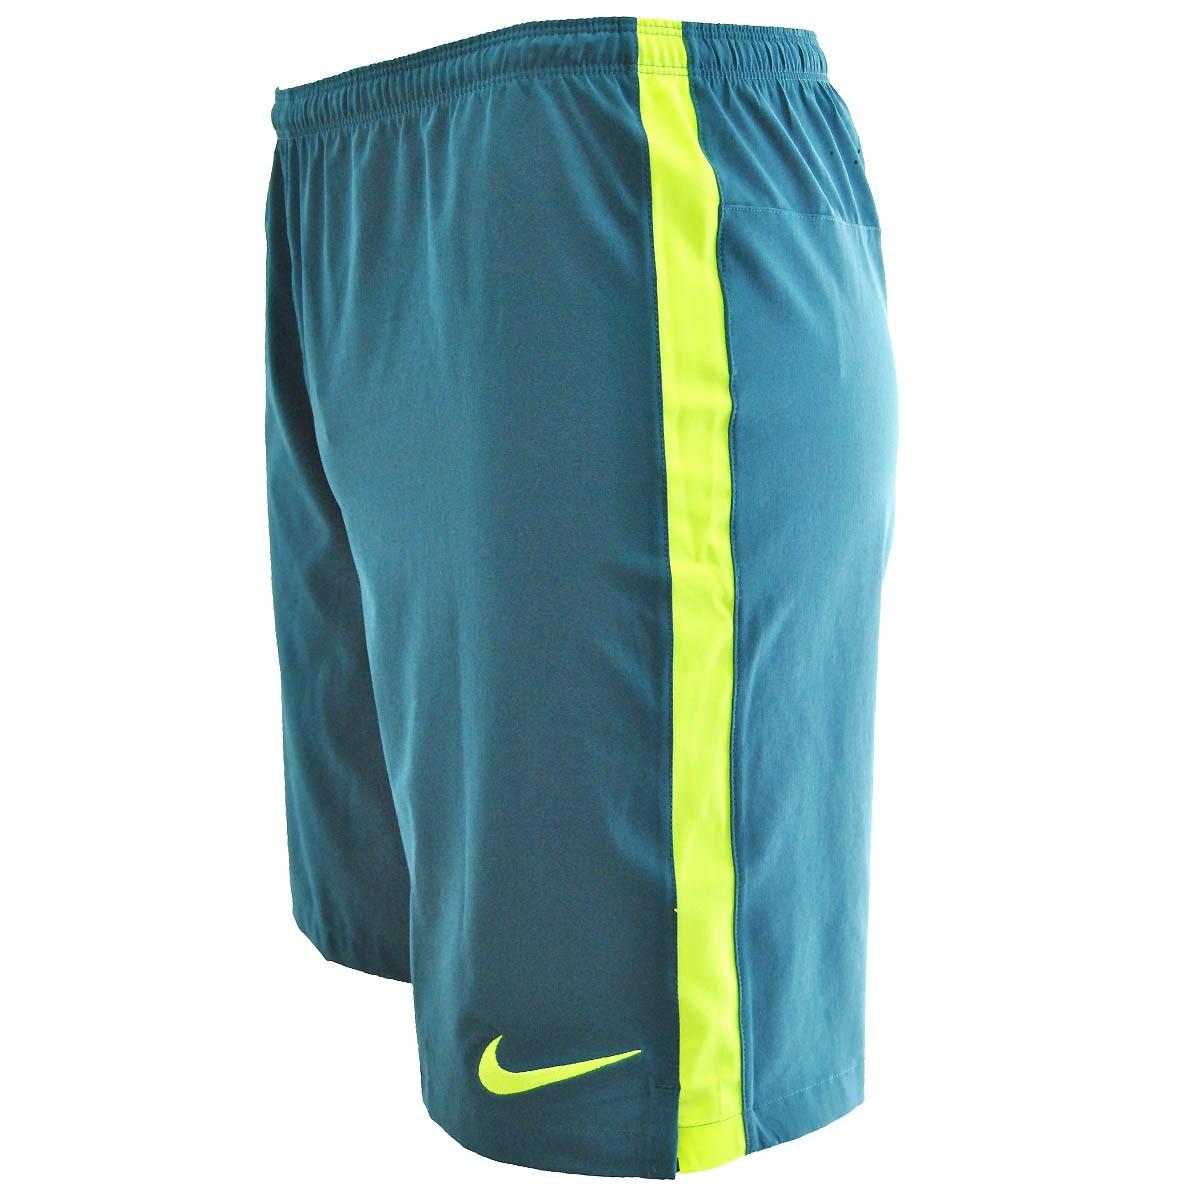 Kit c/ 10 BERMUDAS SHORTS CALÇÃO Nike